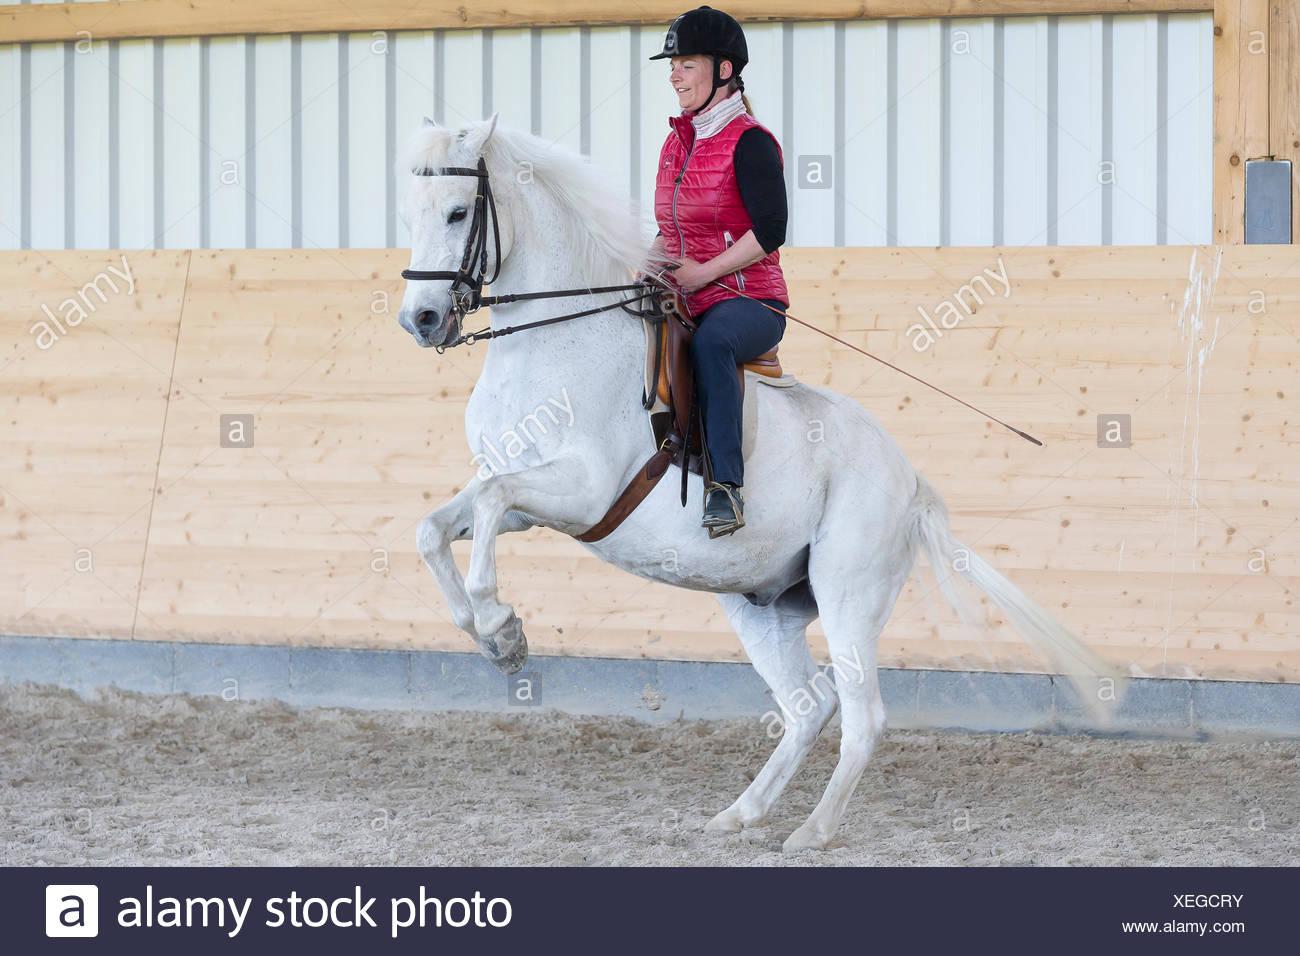 German Riding Pony Rider white pony performing pesade - Stock Image